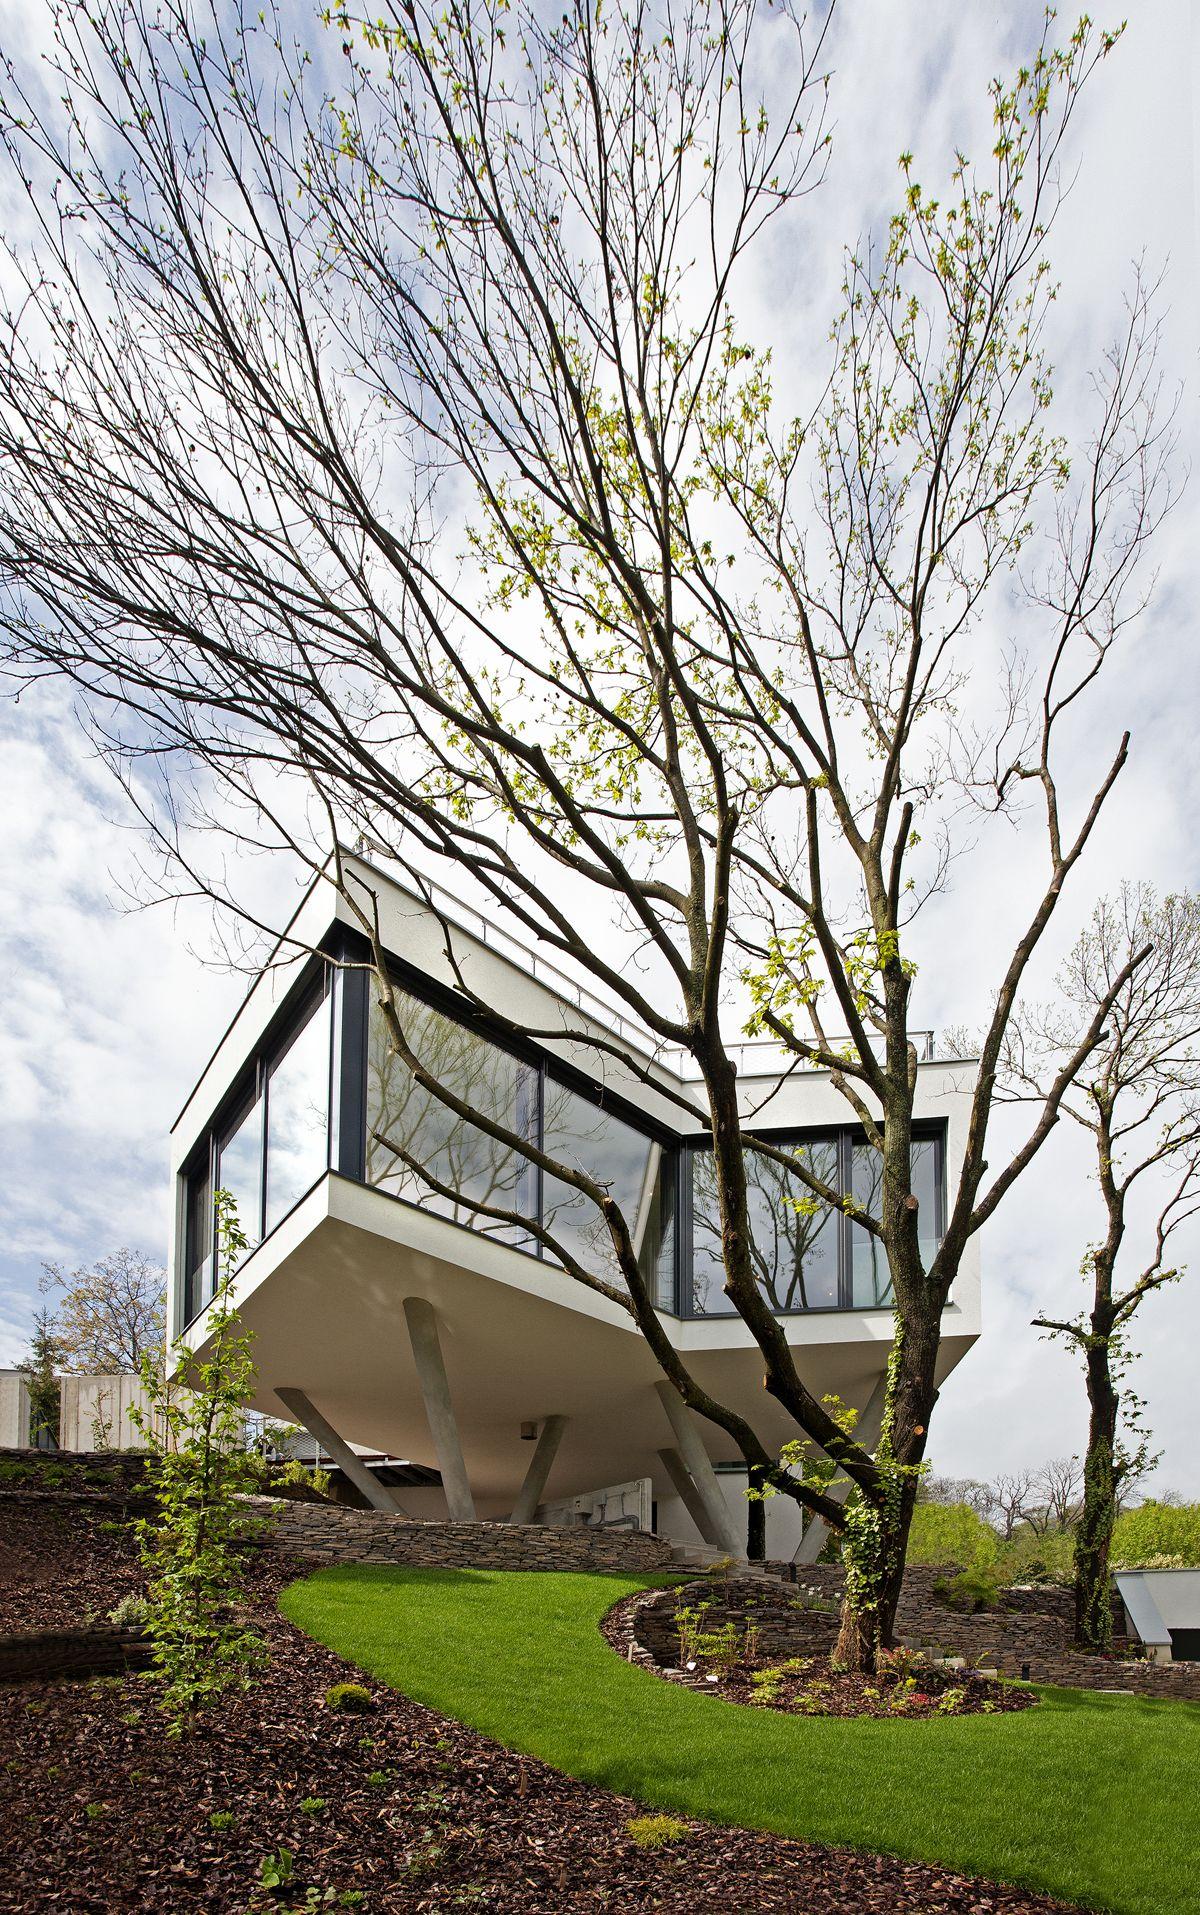 Dom medzi stromami_House between the trees_Architekti Šebo Lichý, Bratislava, Slovensko. Fotograf: Tomáš Manina